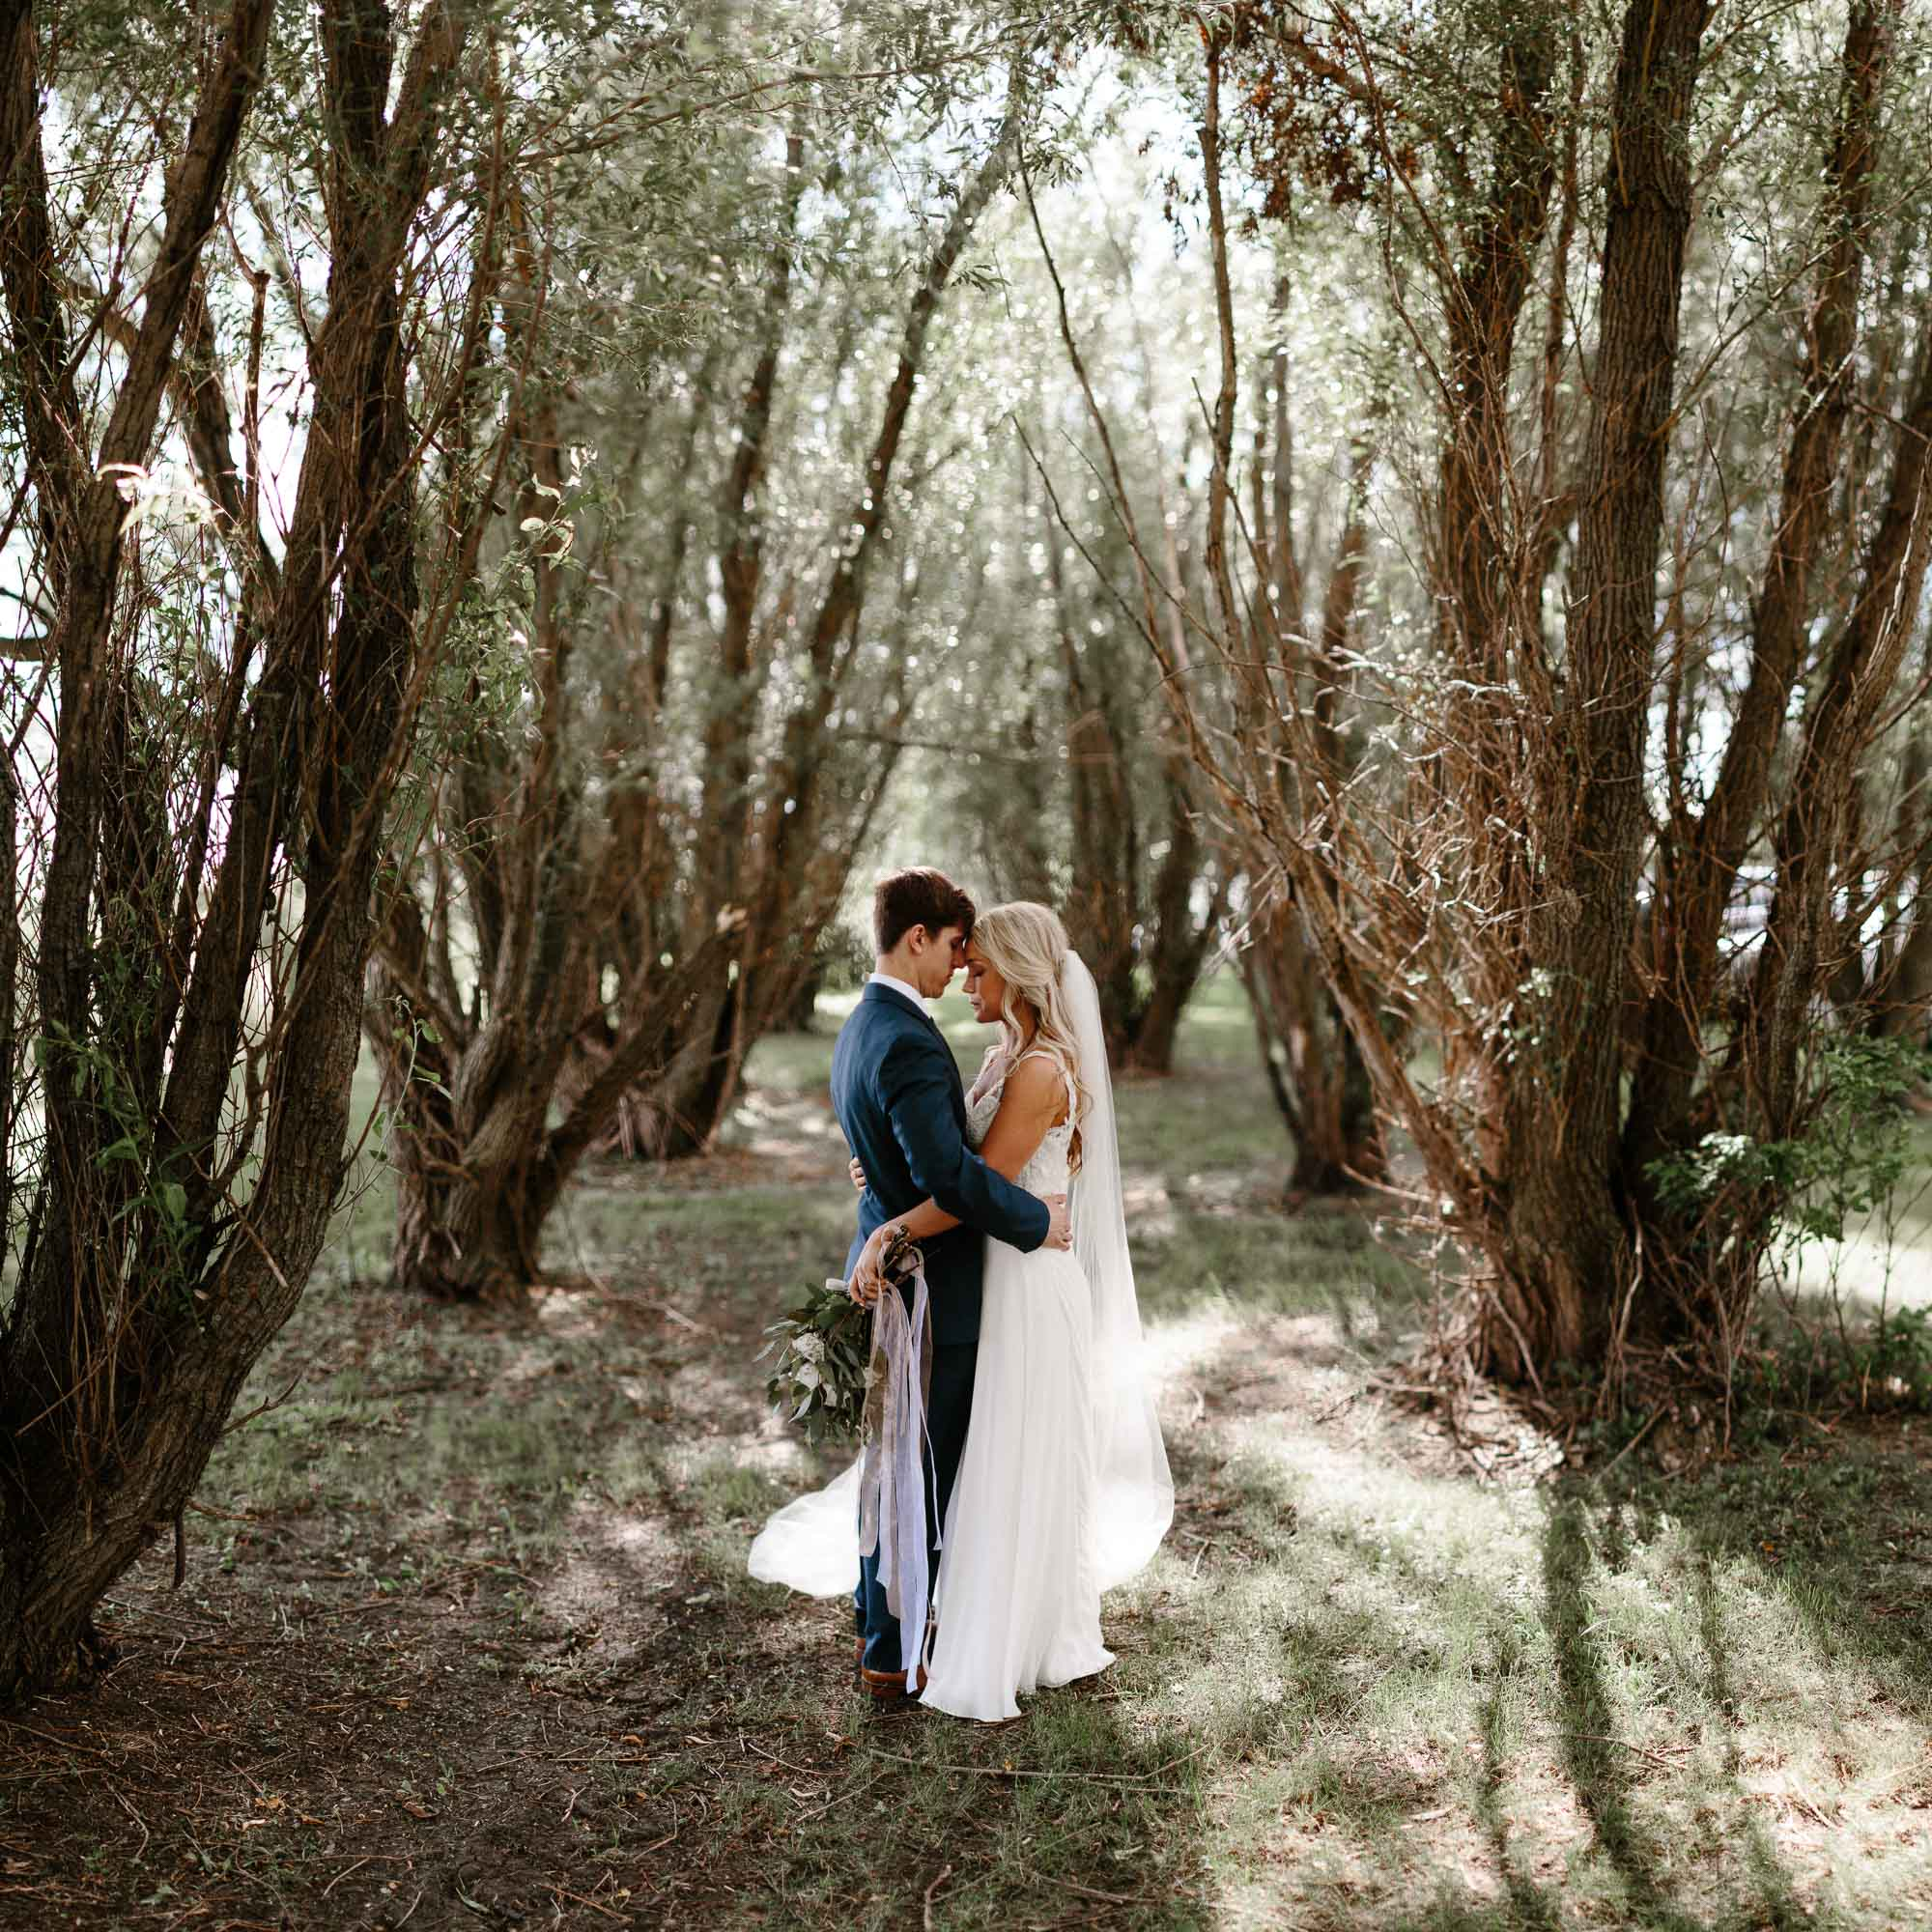 Intimate_Farmhouse_SD_Wedding_Bridgette_Philip_046.jpg